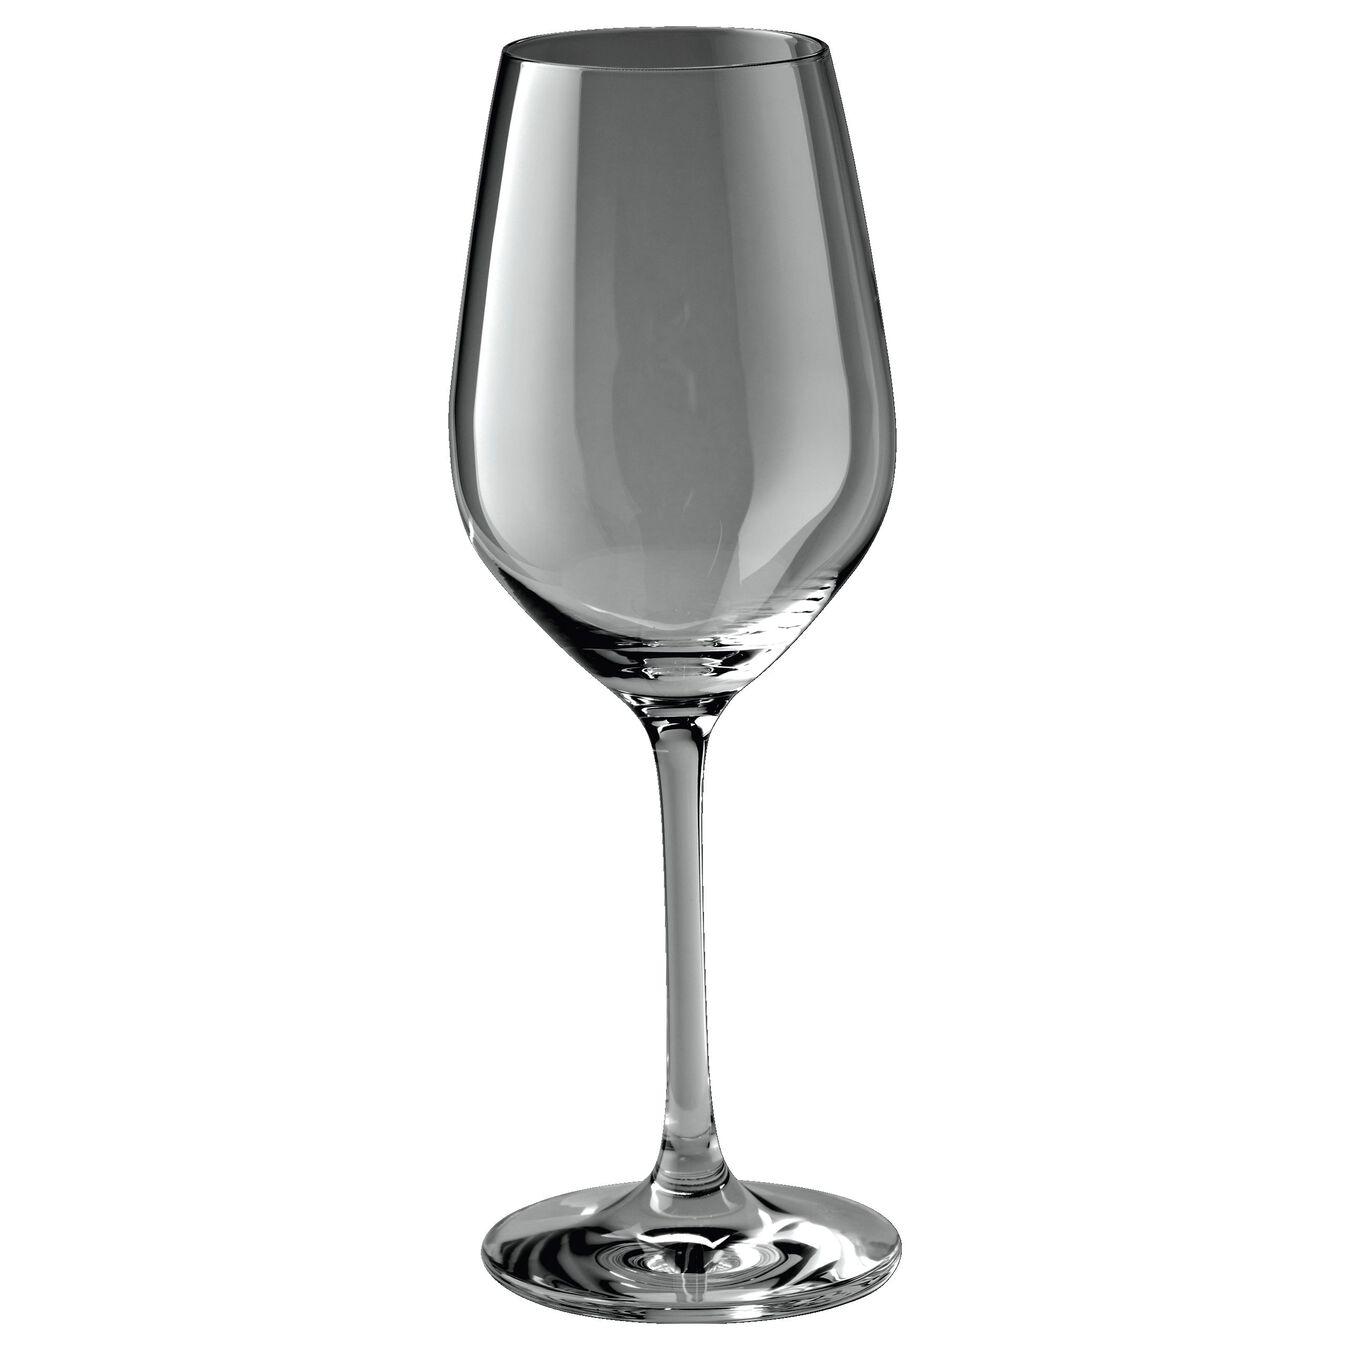 Weissweinglas 275 ml,,large 1